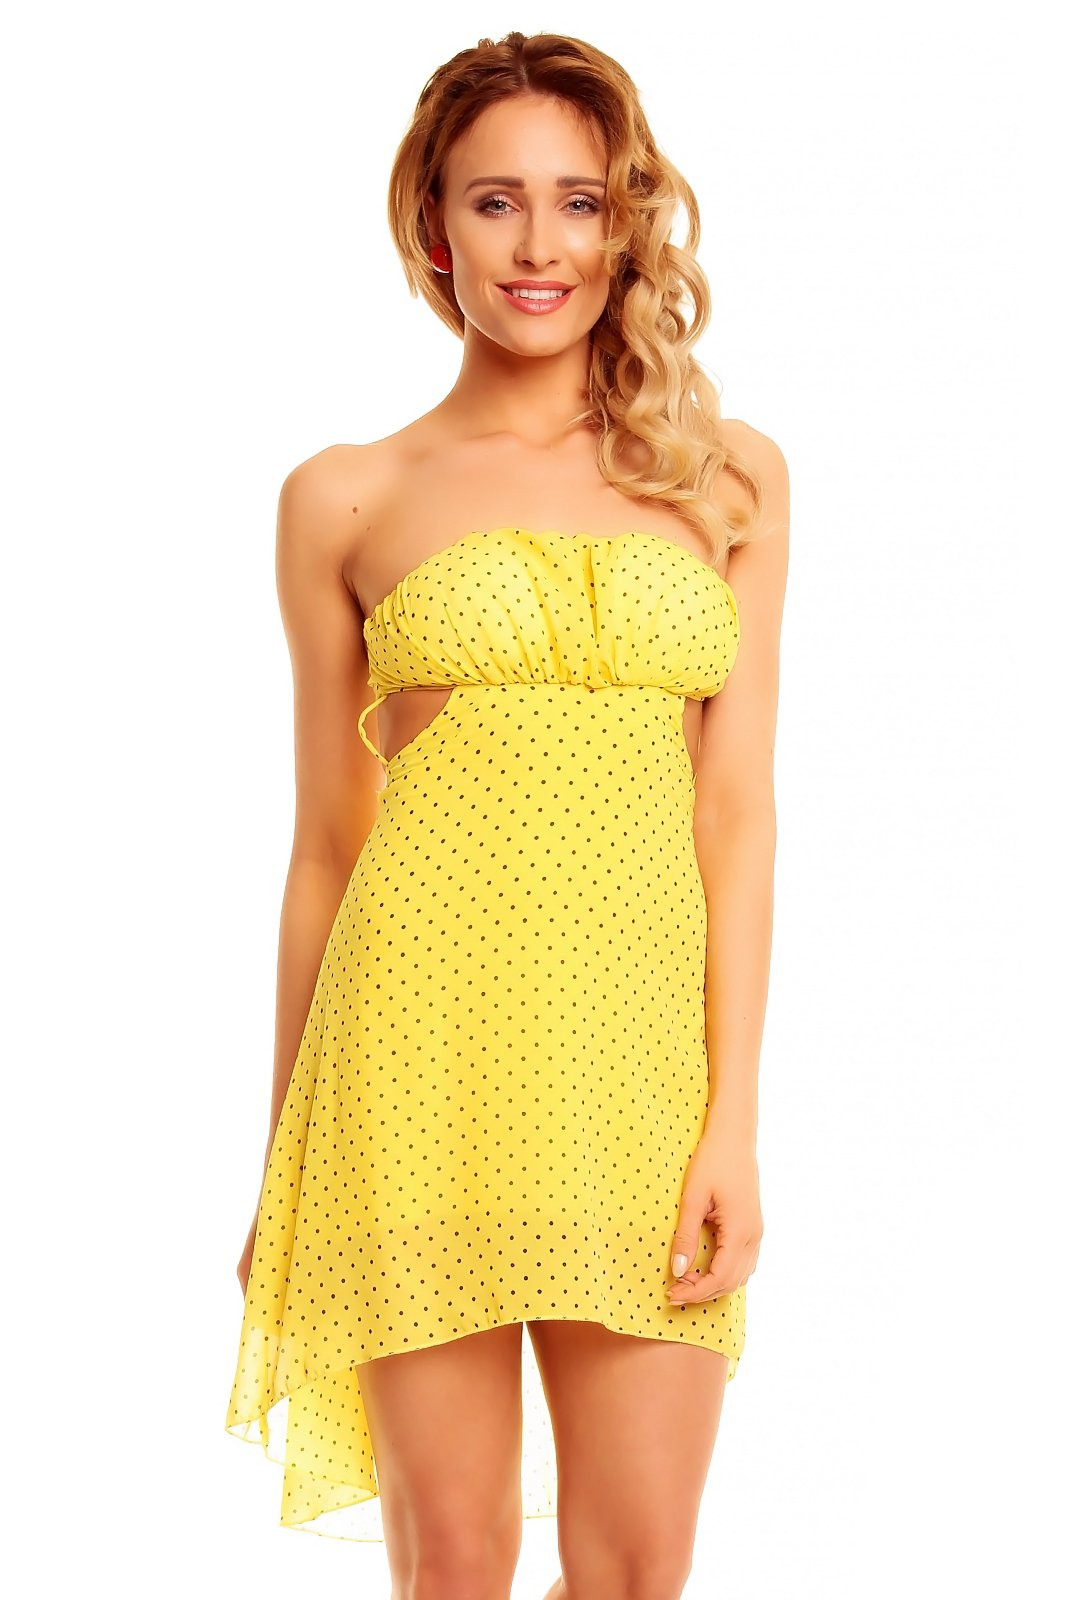 Damen Kleid Mini Tunika Sommer Punktemuster Nackte